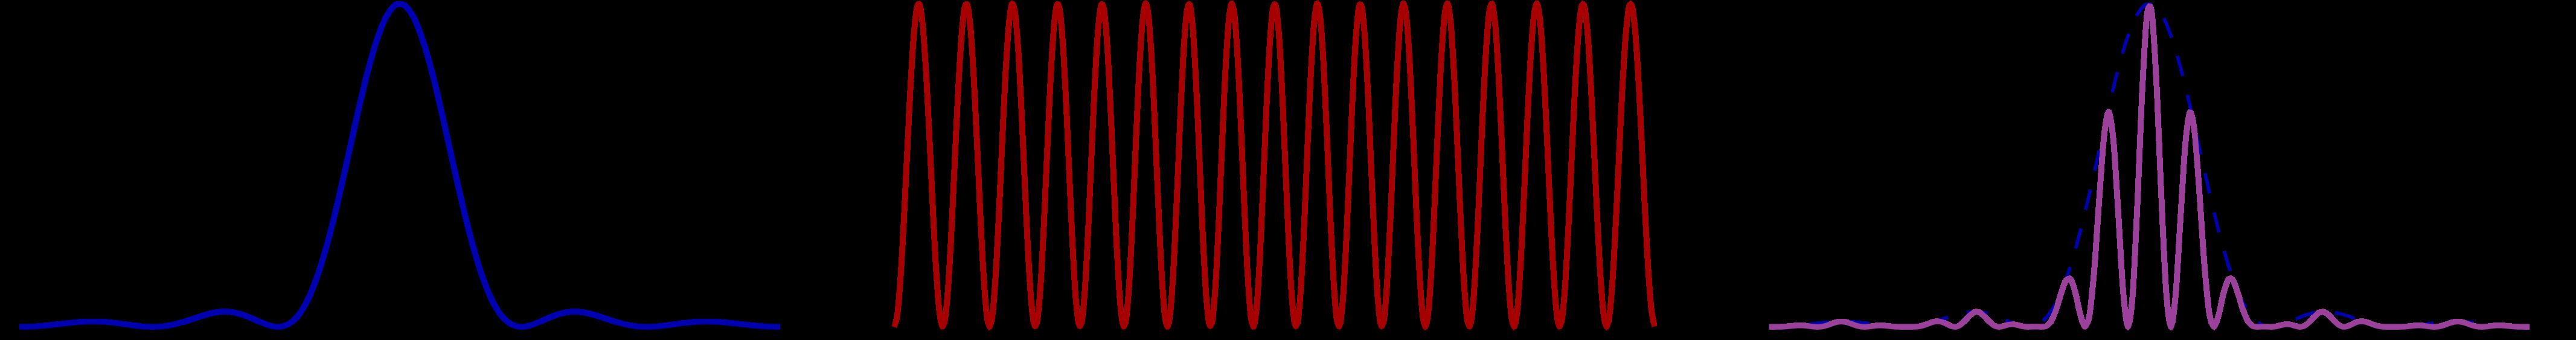 optics_diffraction-001.png